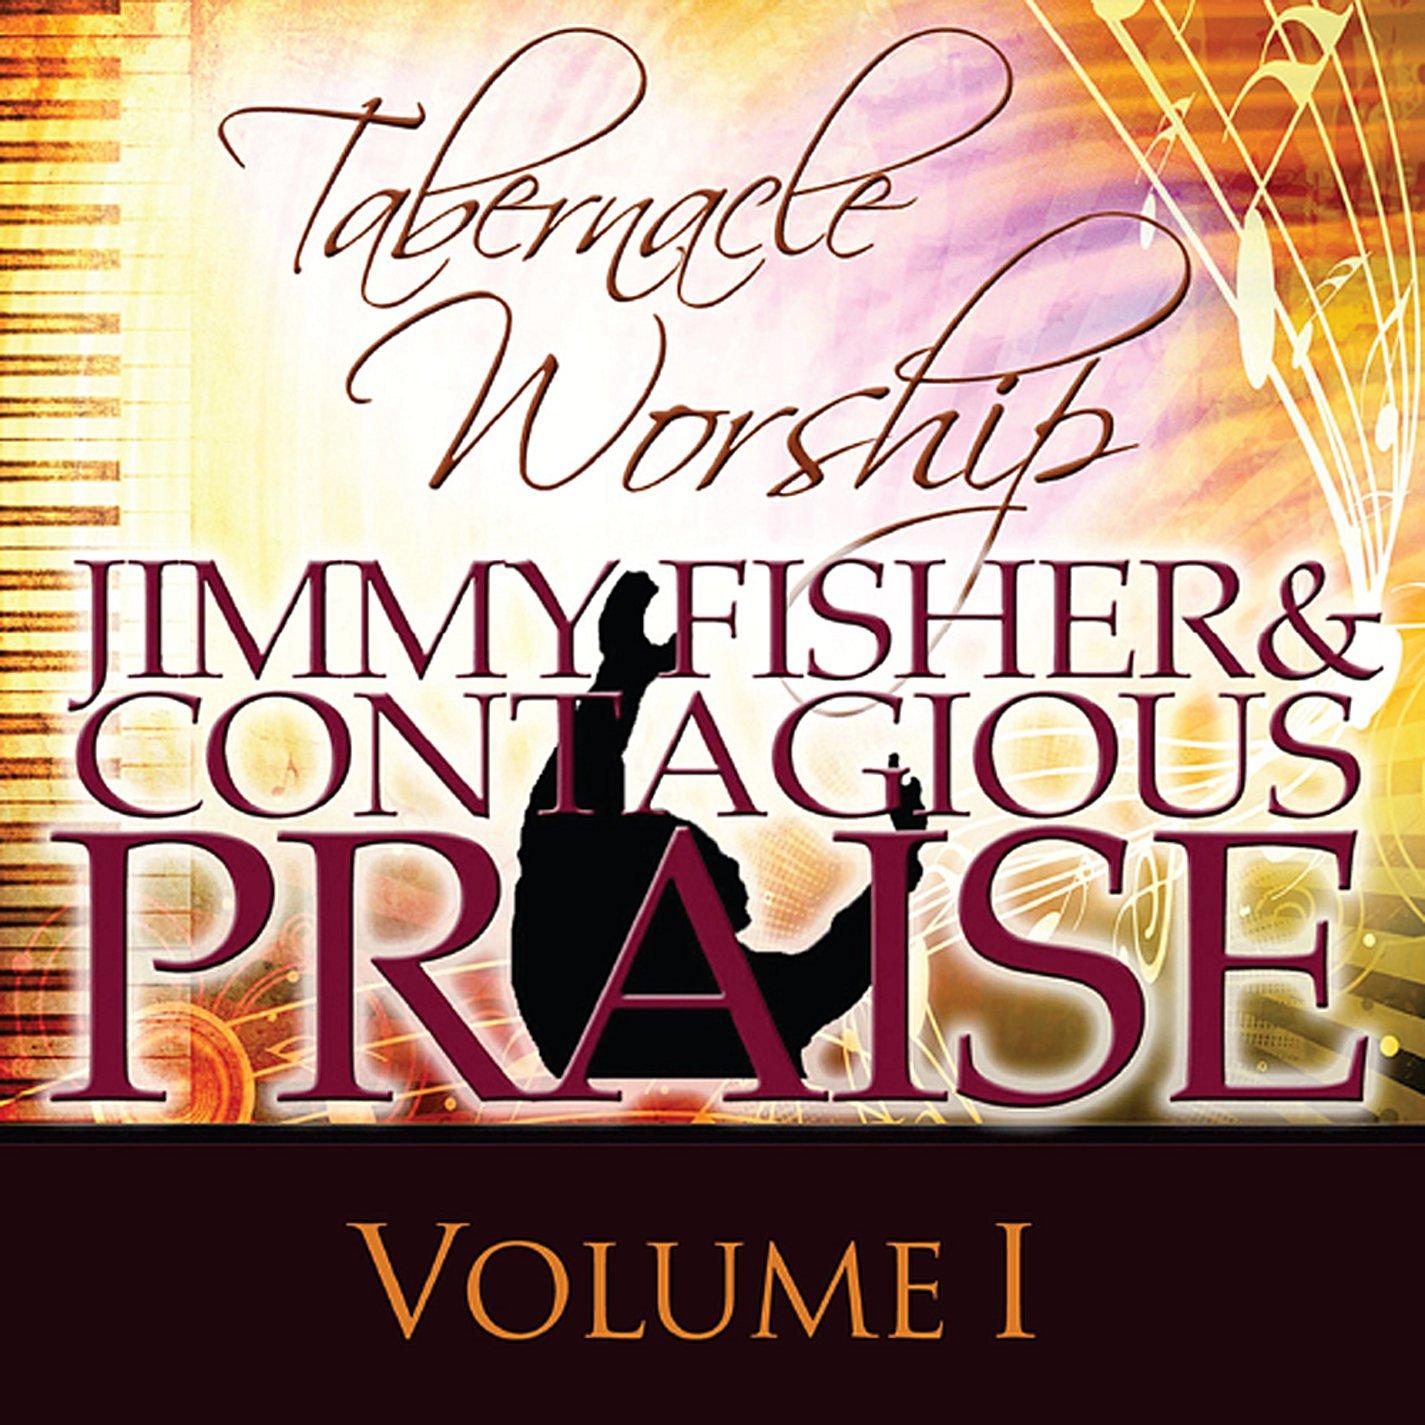 Tabernacle Worship Volume I                                                                                                                                                                                                                                                    <span class=